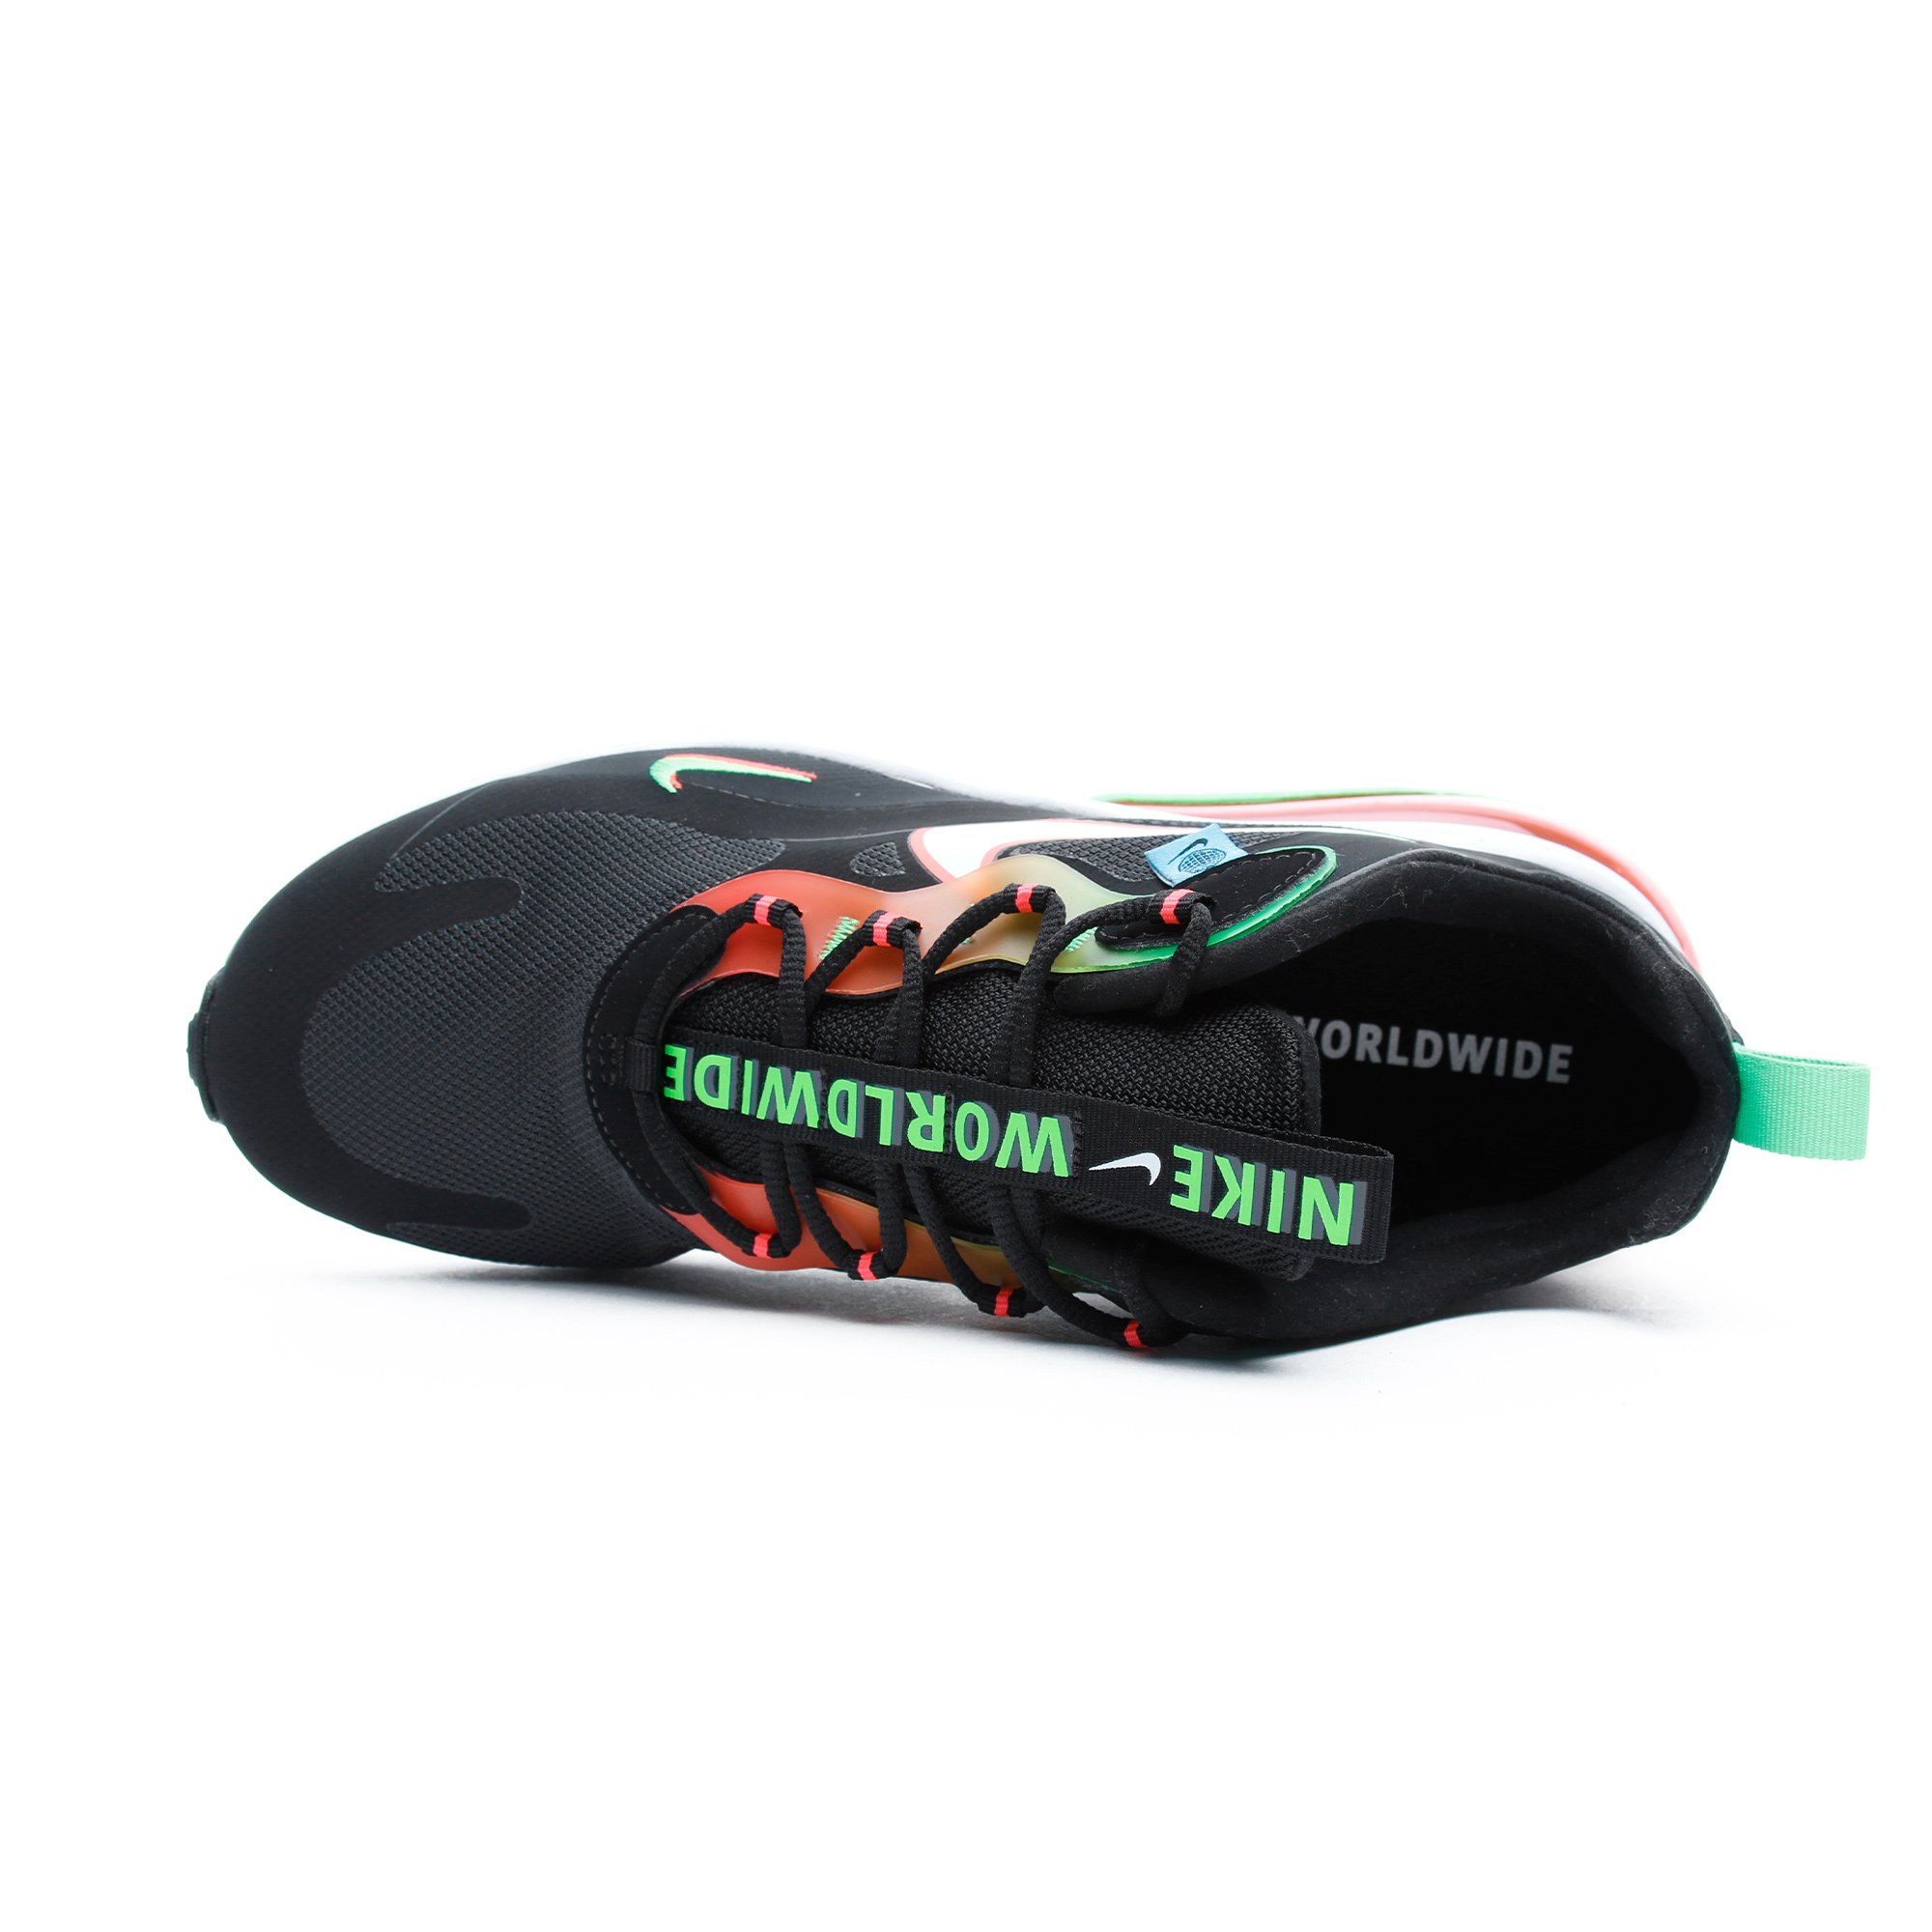 Air Max 270 React Erkek Siyah Spor Ayakkabı